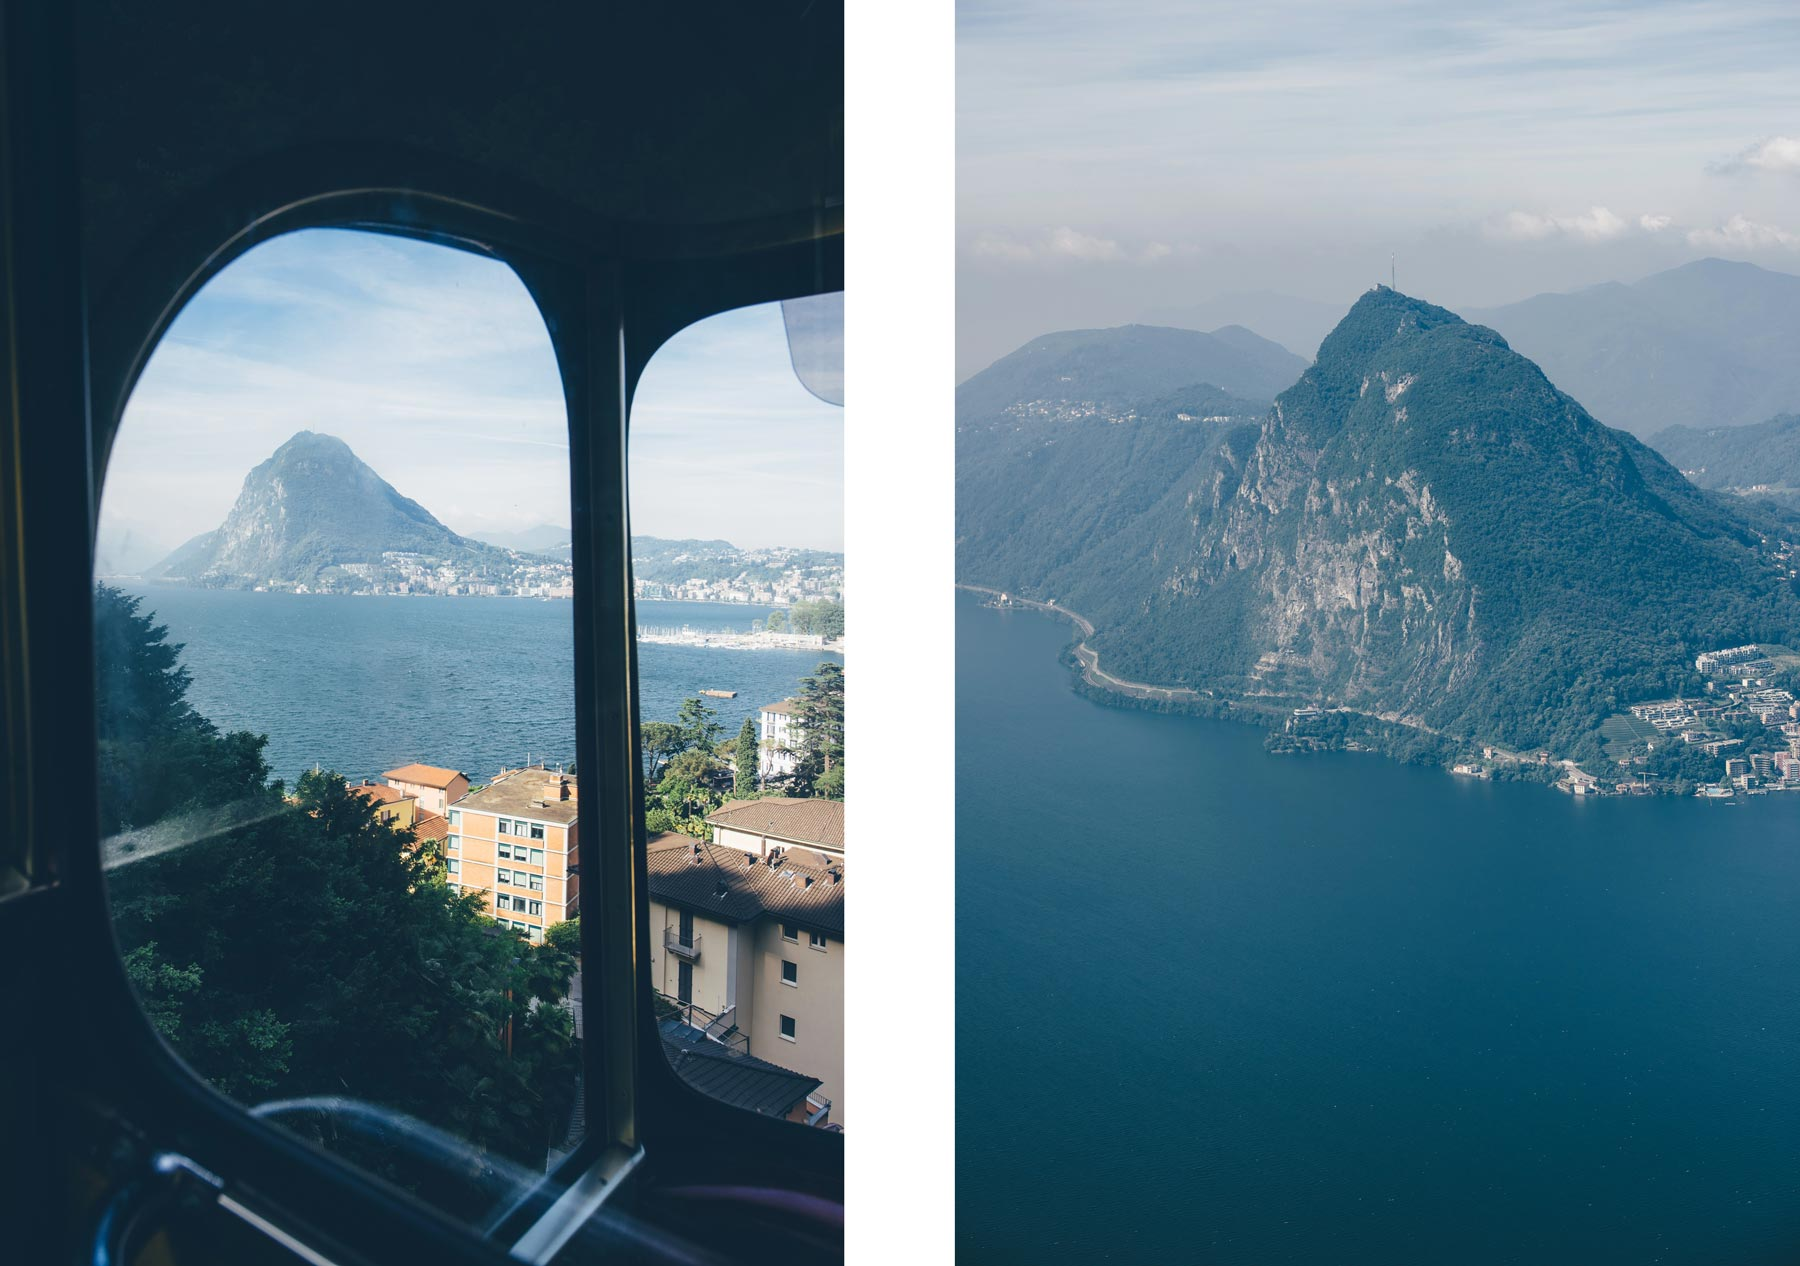 Vue sur San Salvadore depuis Monte Brè, Lugano, Suisse